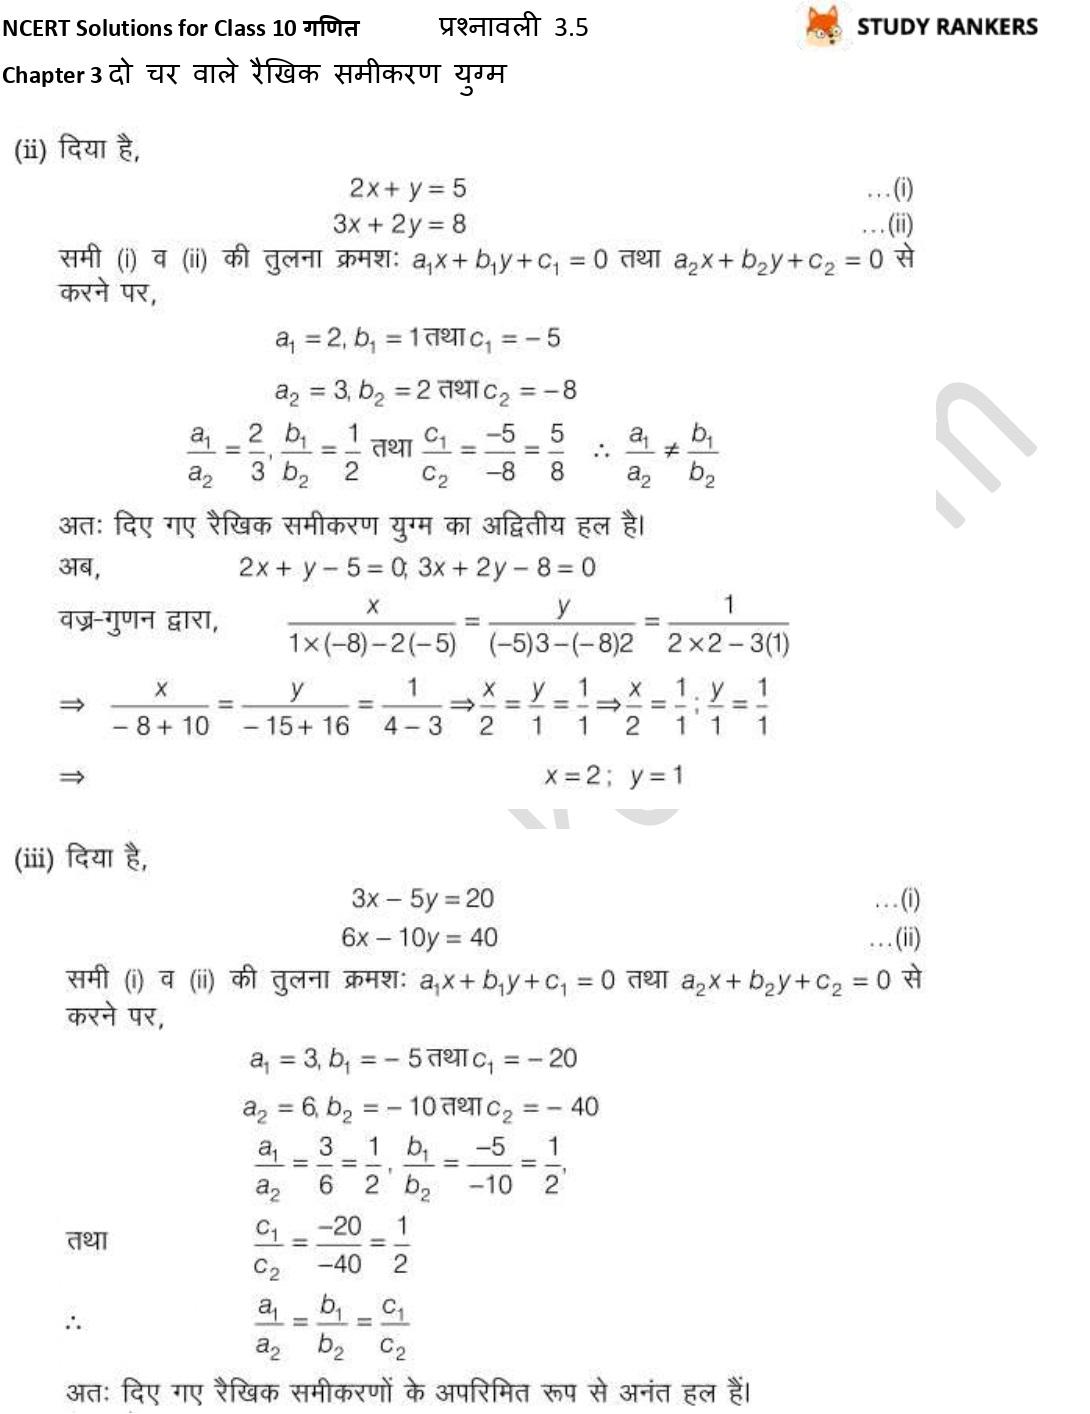 NCERT Solutions for Class 10 Maths Chapter 3 दो चर वाले रैखिक समीकरण युग्म प्रश्नावली 3.5 Part 2